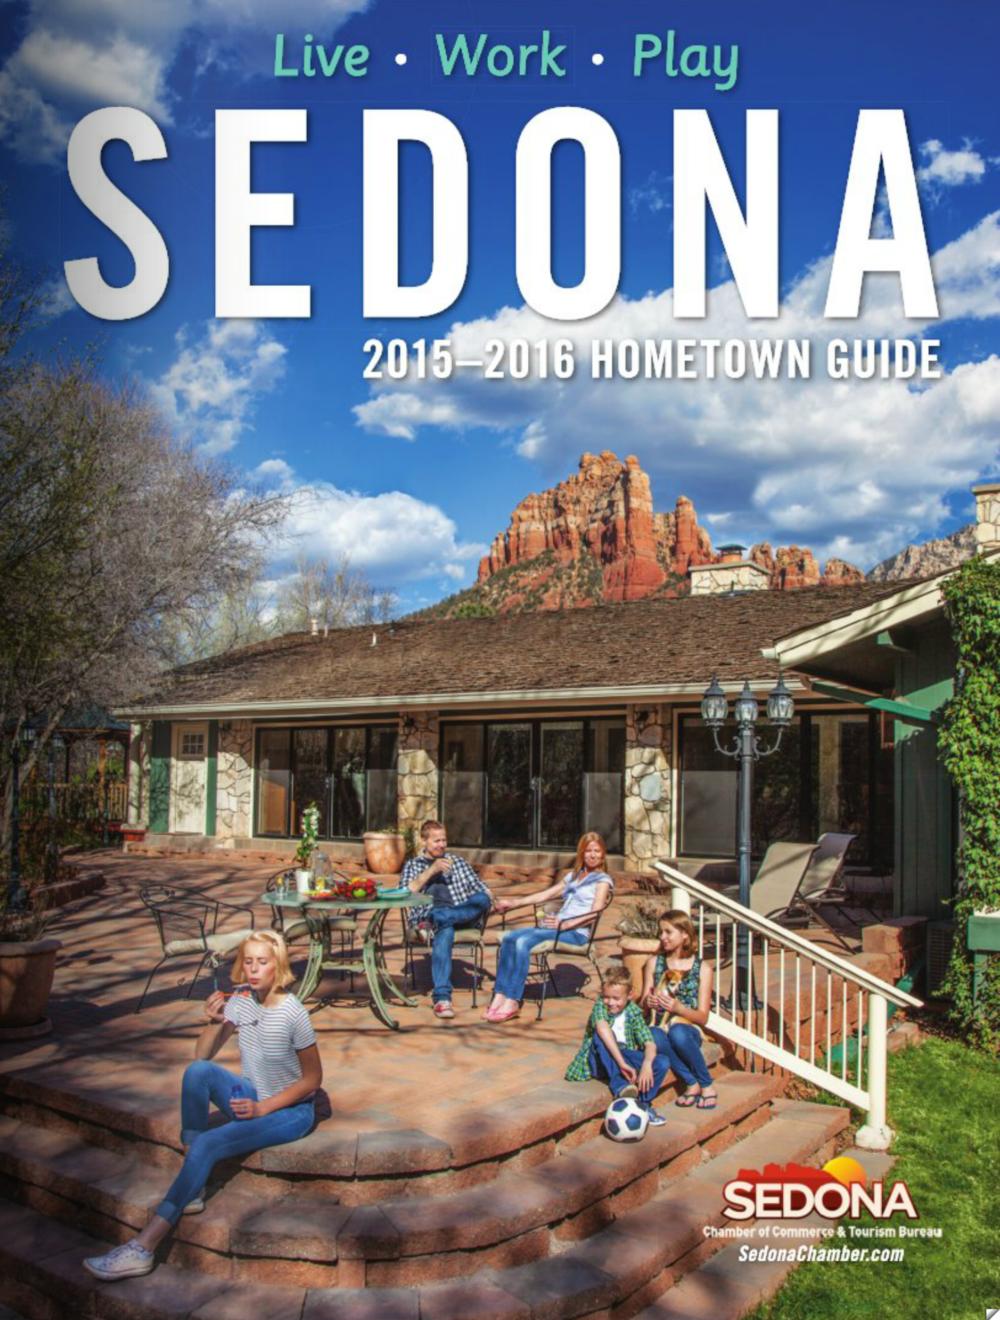 Sedona 2015-2016 Hometown Guide Cover